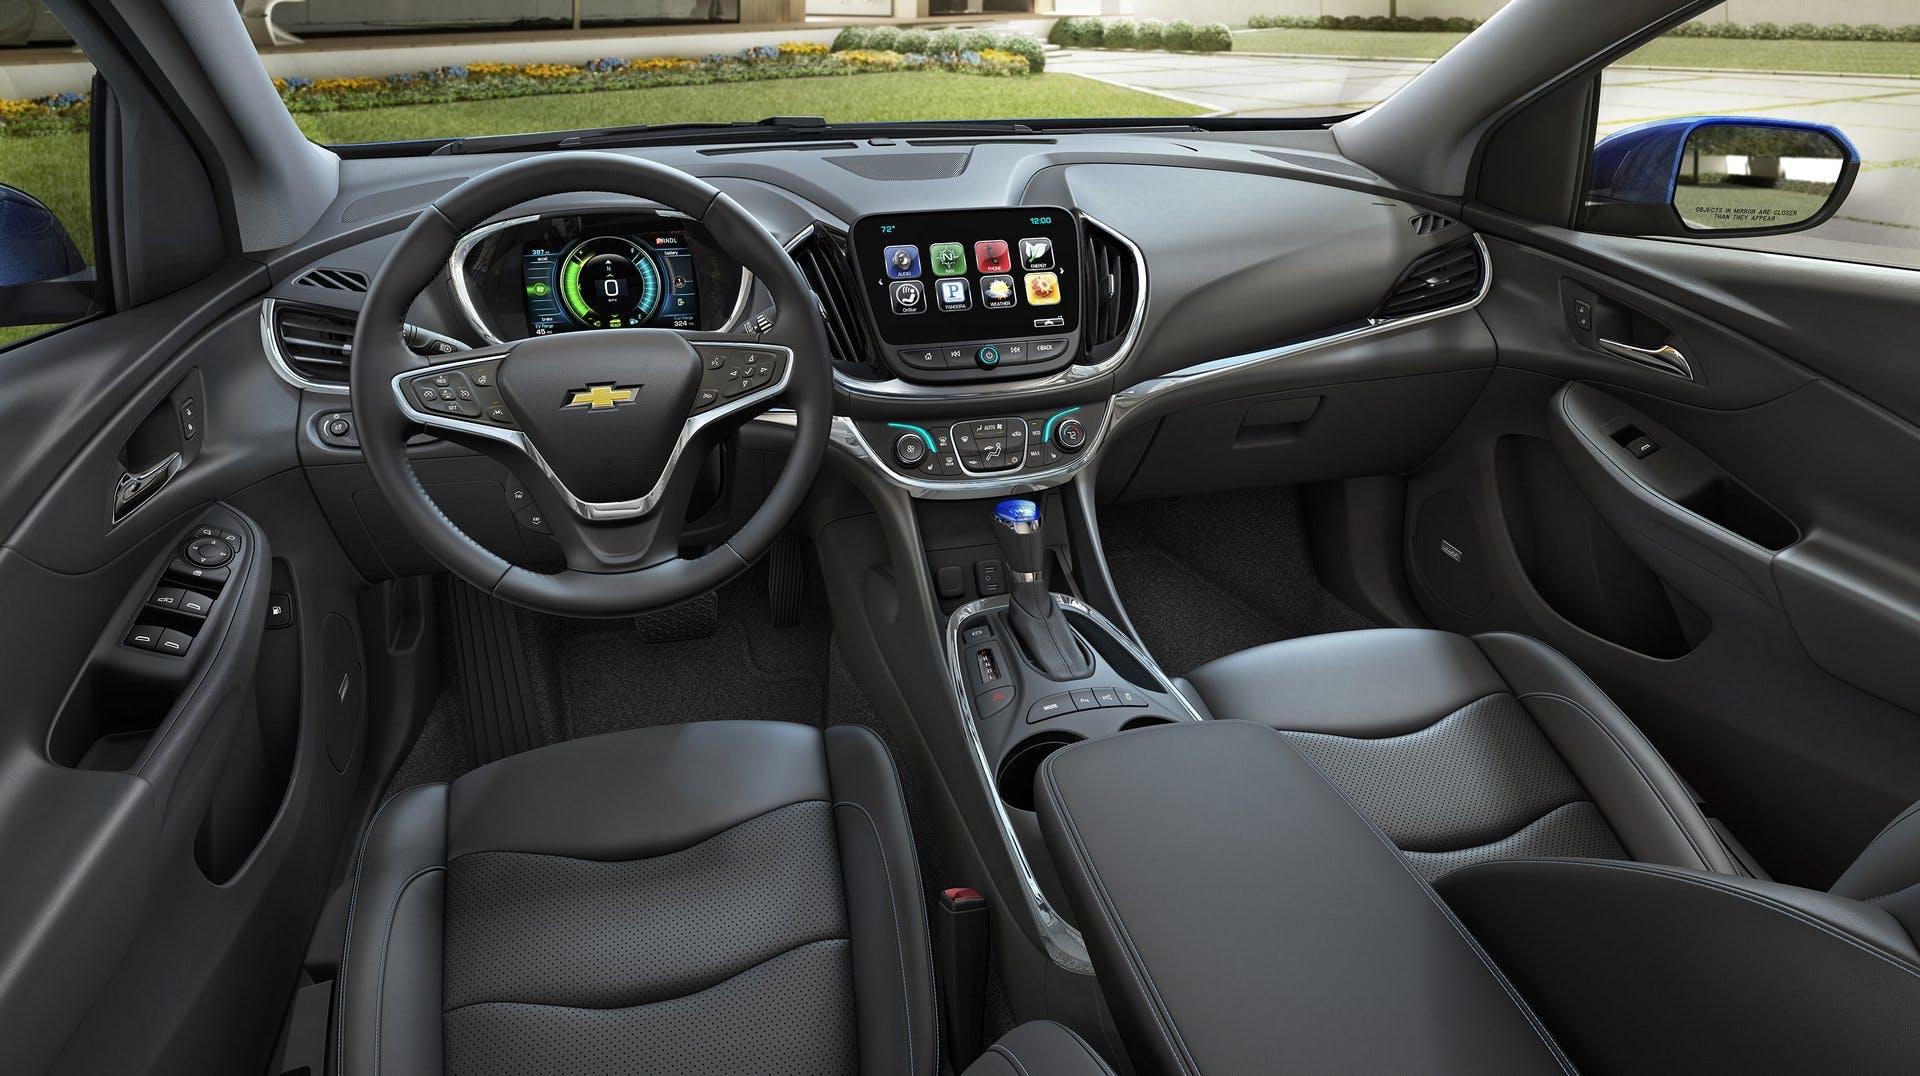 ChevroletVolt2016-008